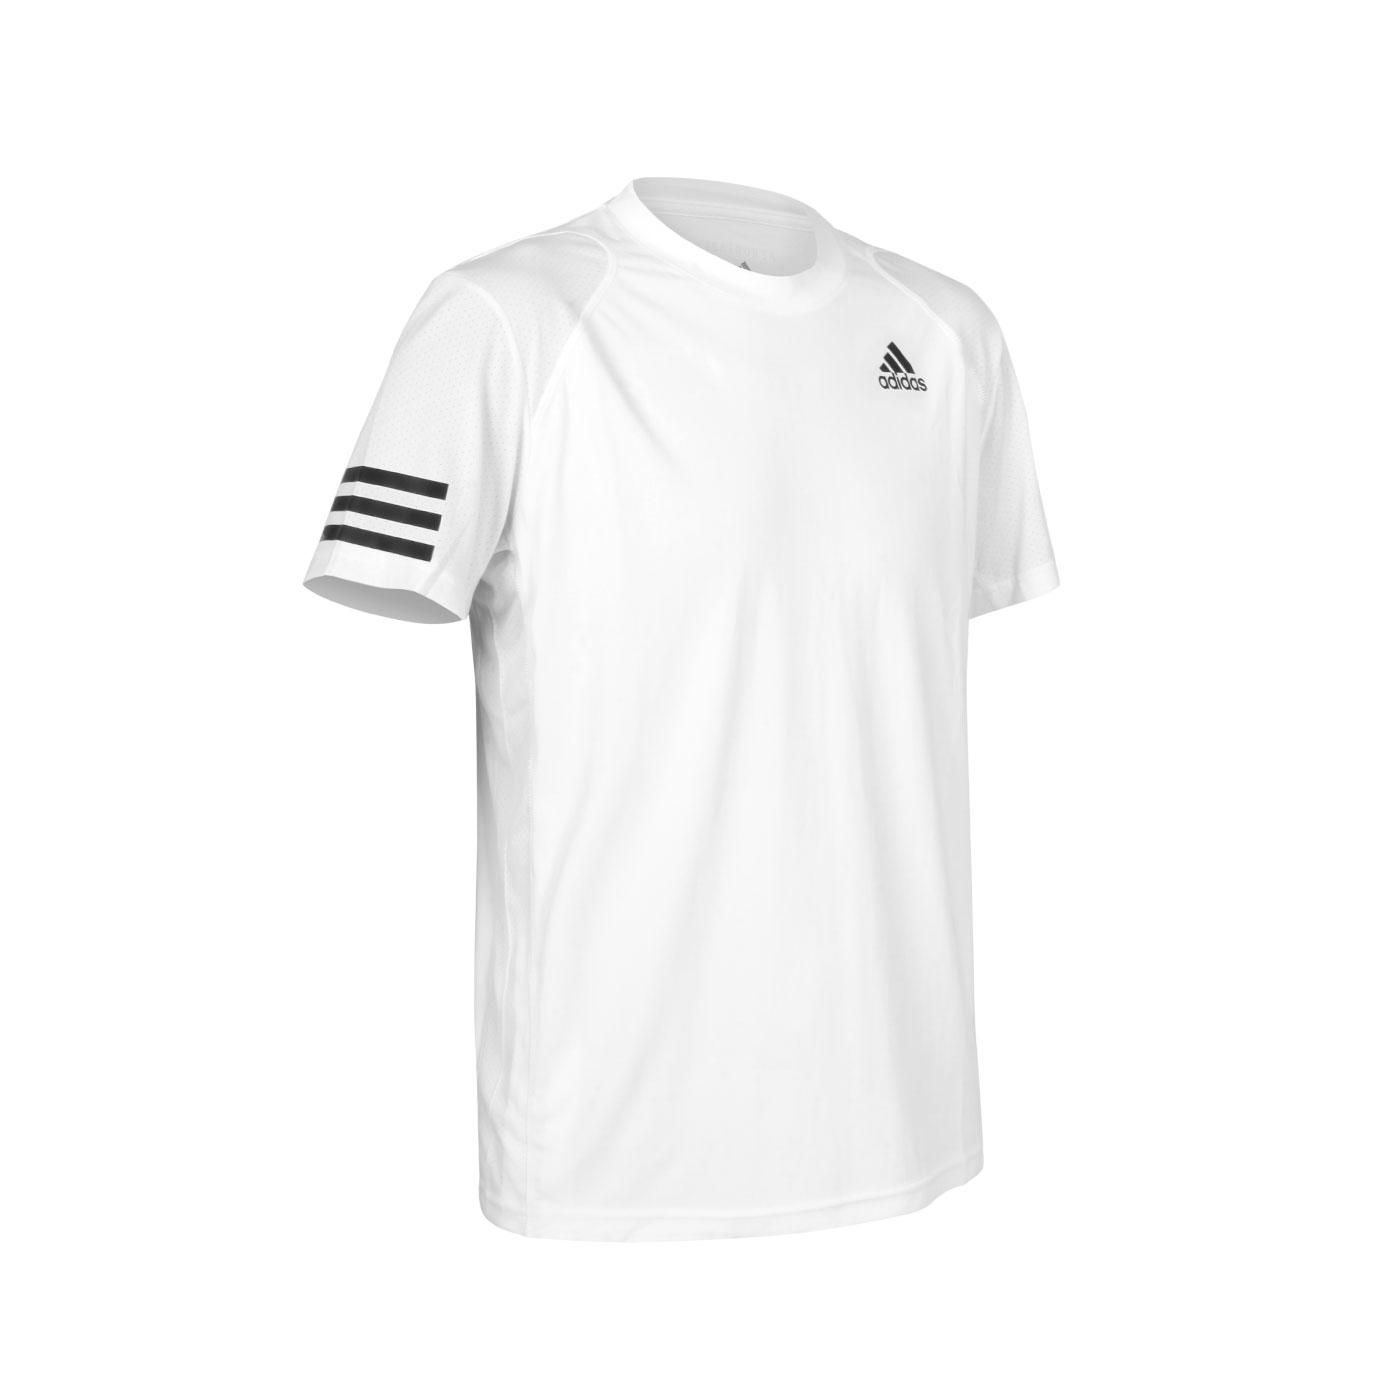 ADIDAS 男款短袖T恤 GL5401 - 白黑